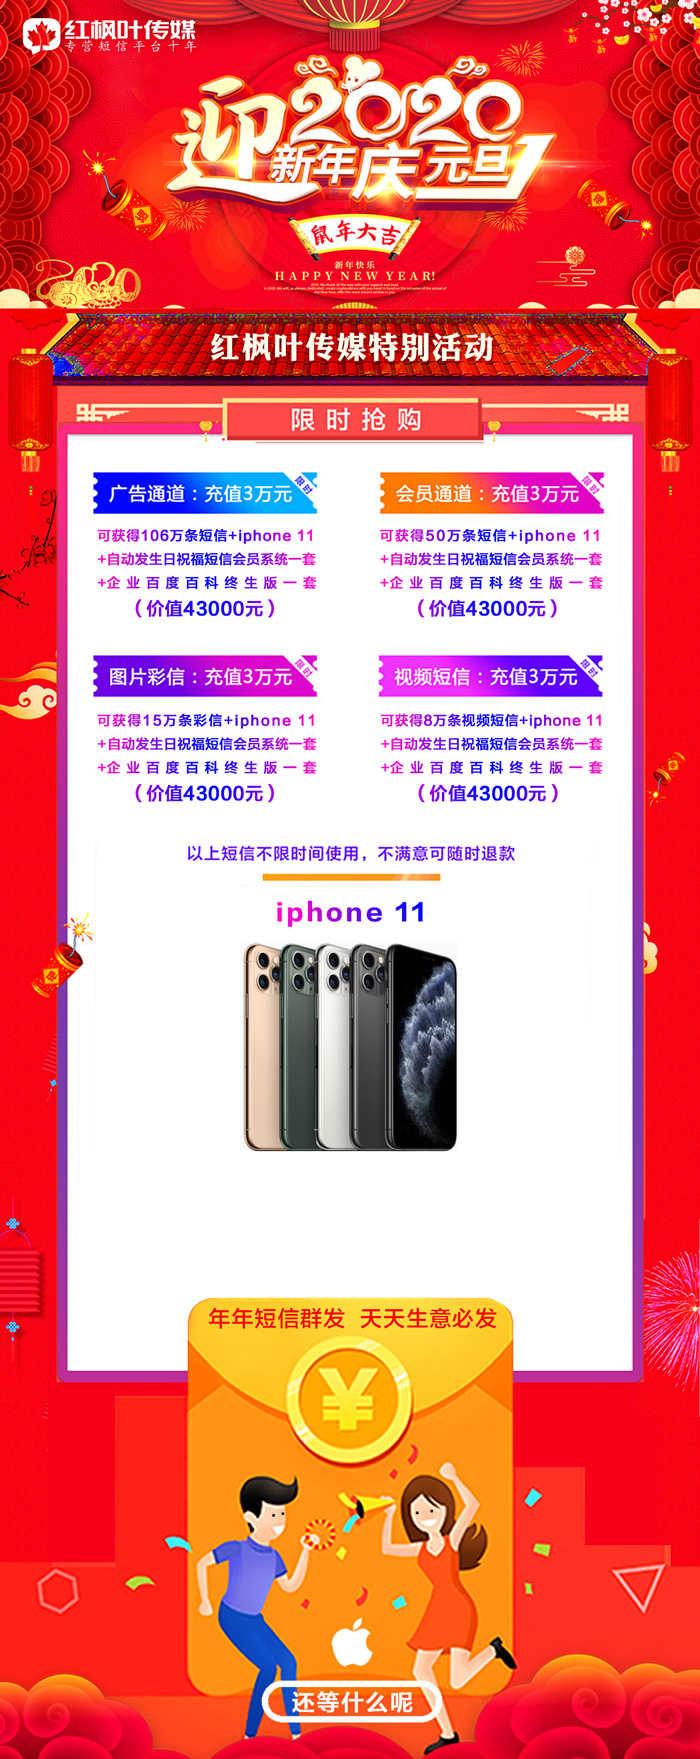 iphoneXs.jpg